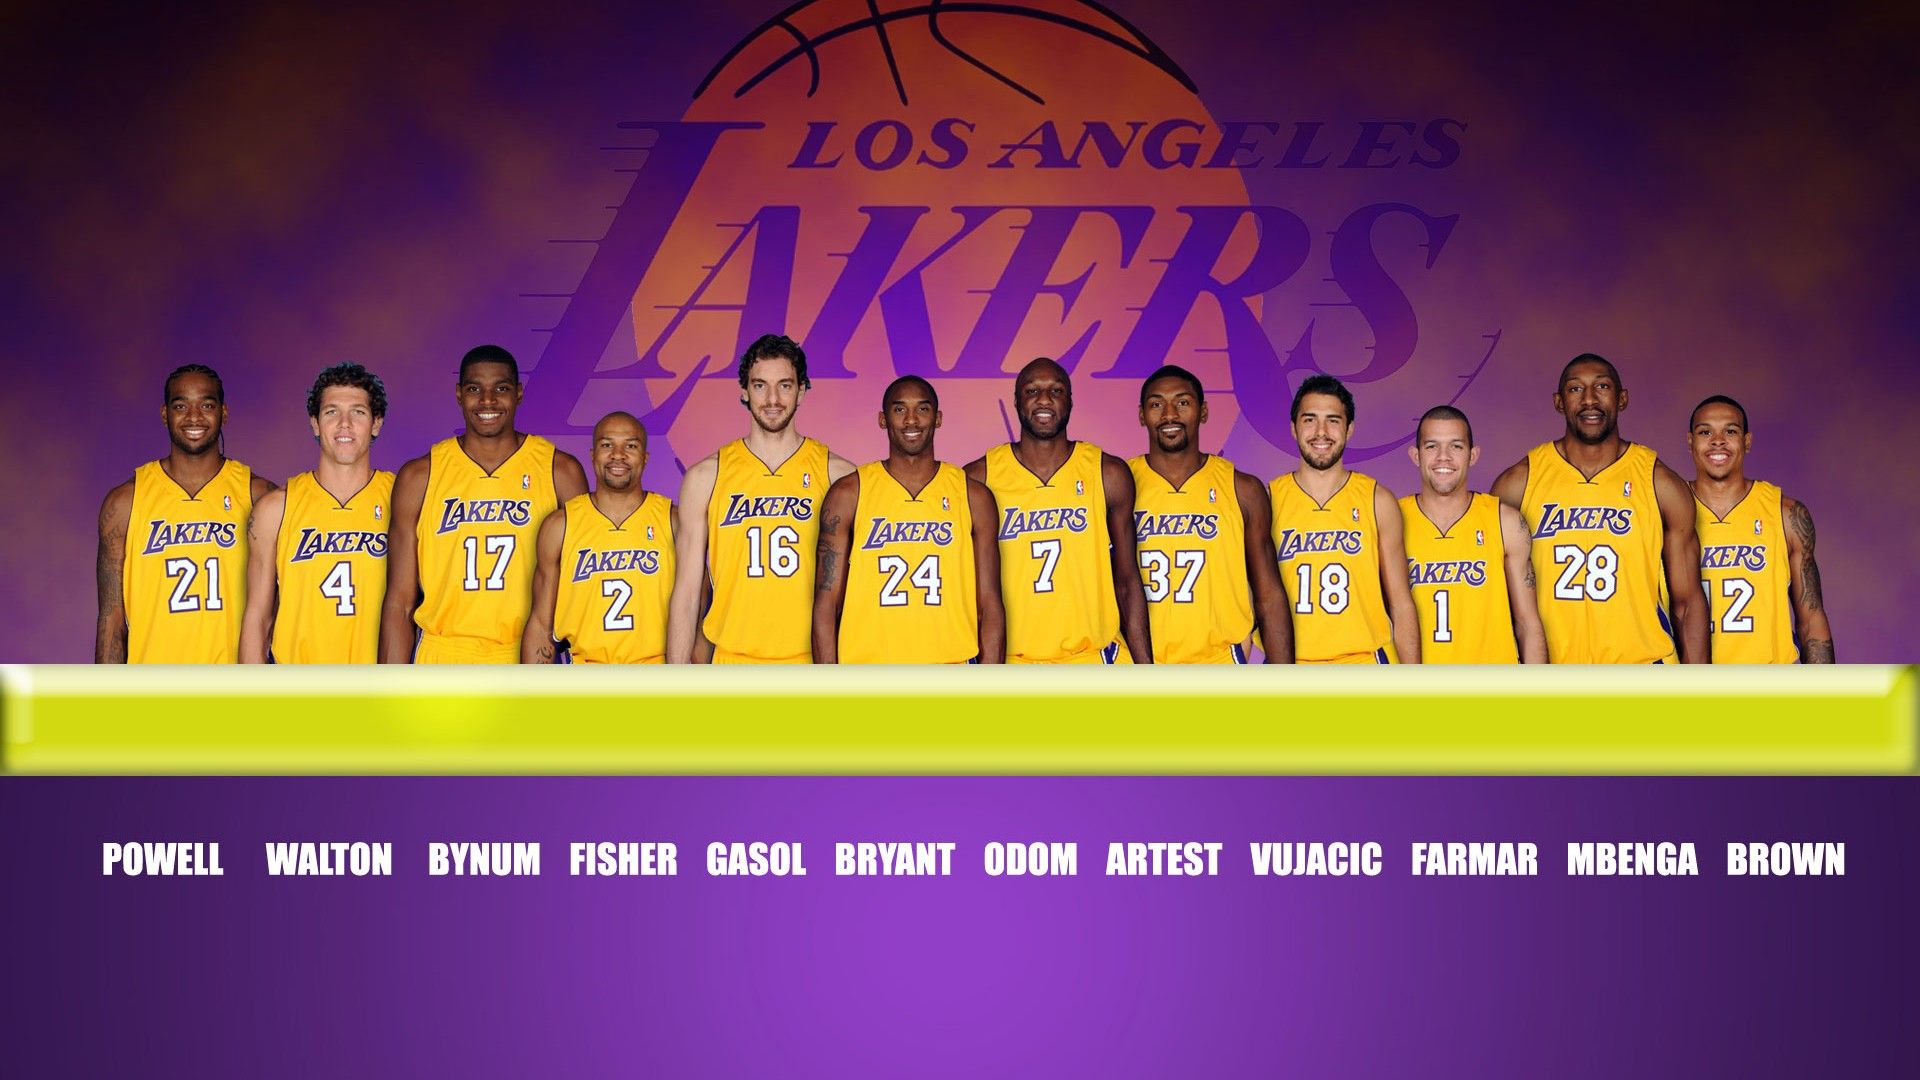 Los Angeles Lakers For Mac Wallpaper In 2020 Team Wallpaper Los Angeles Lakers Lakers Wallpaper